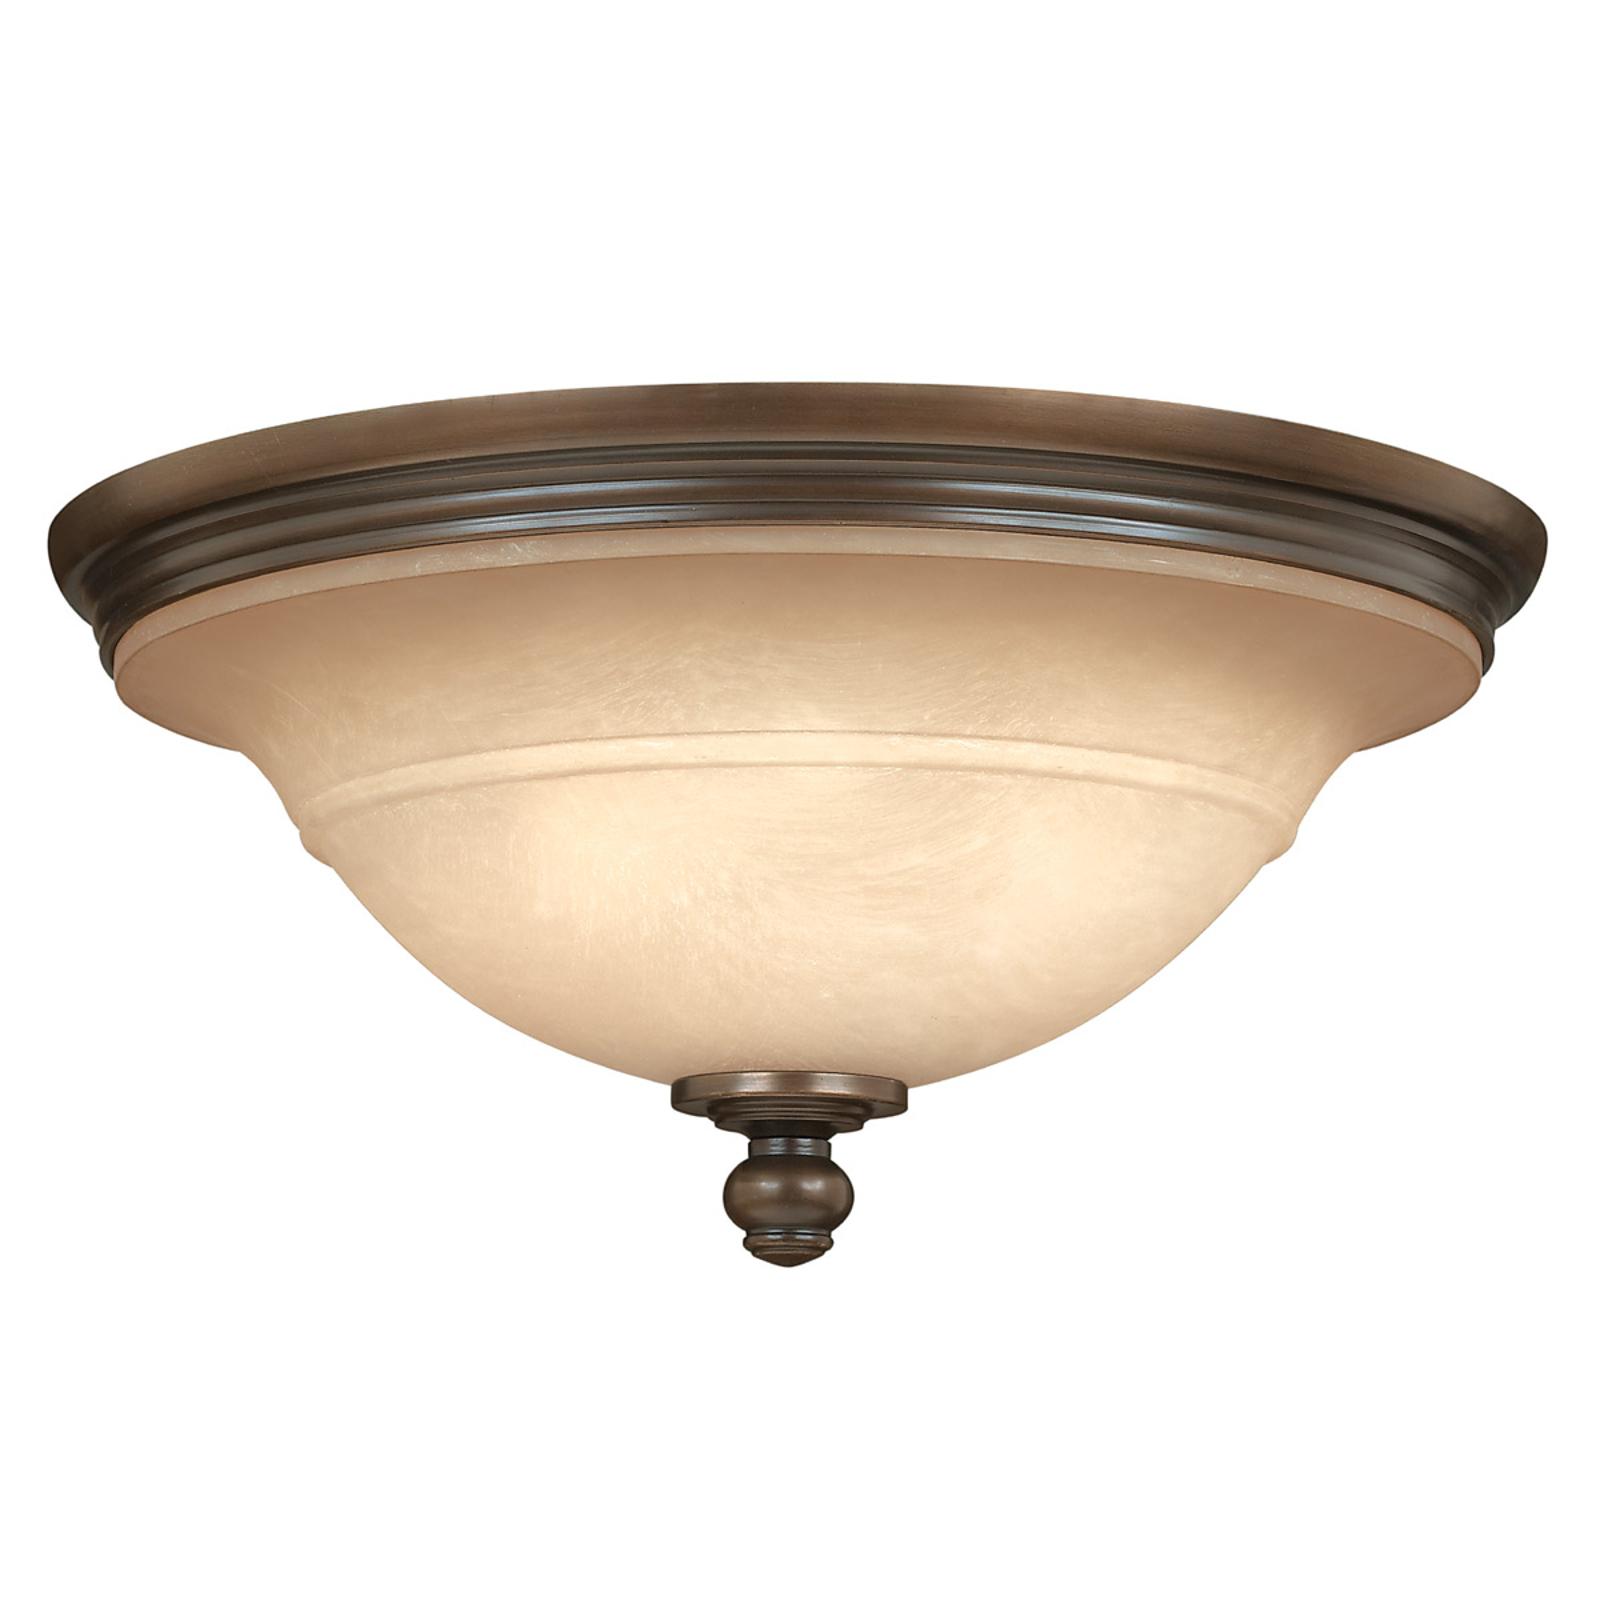 Rustykalna lampa sufitowa PLYMOUTH